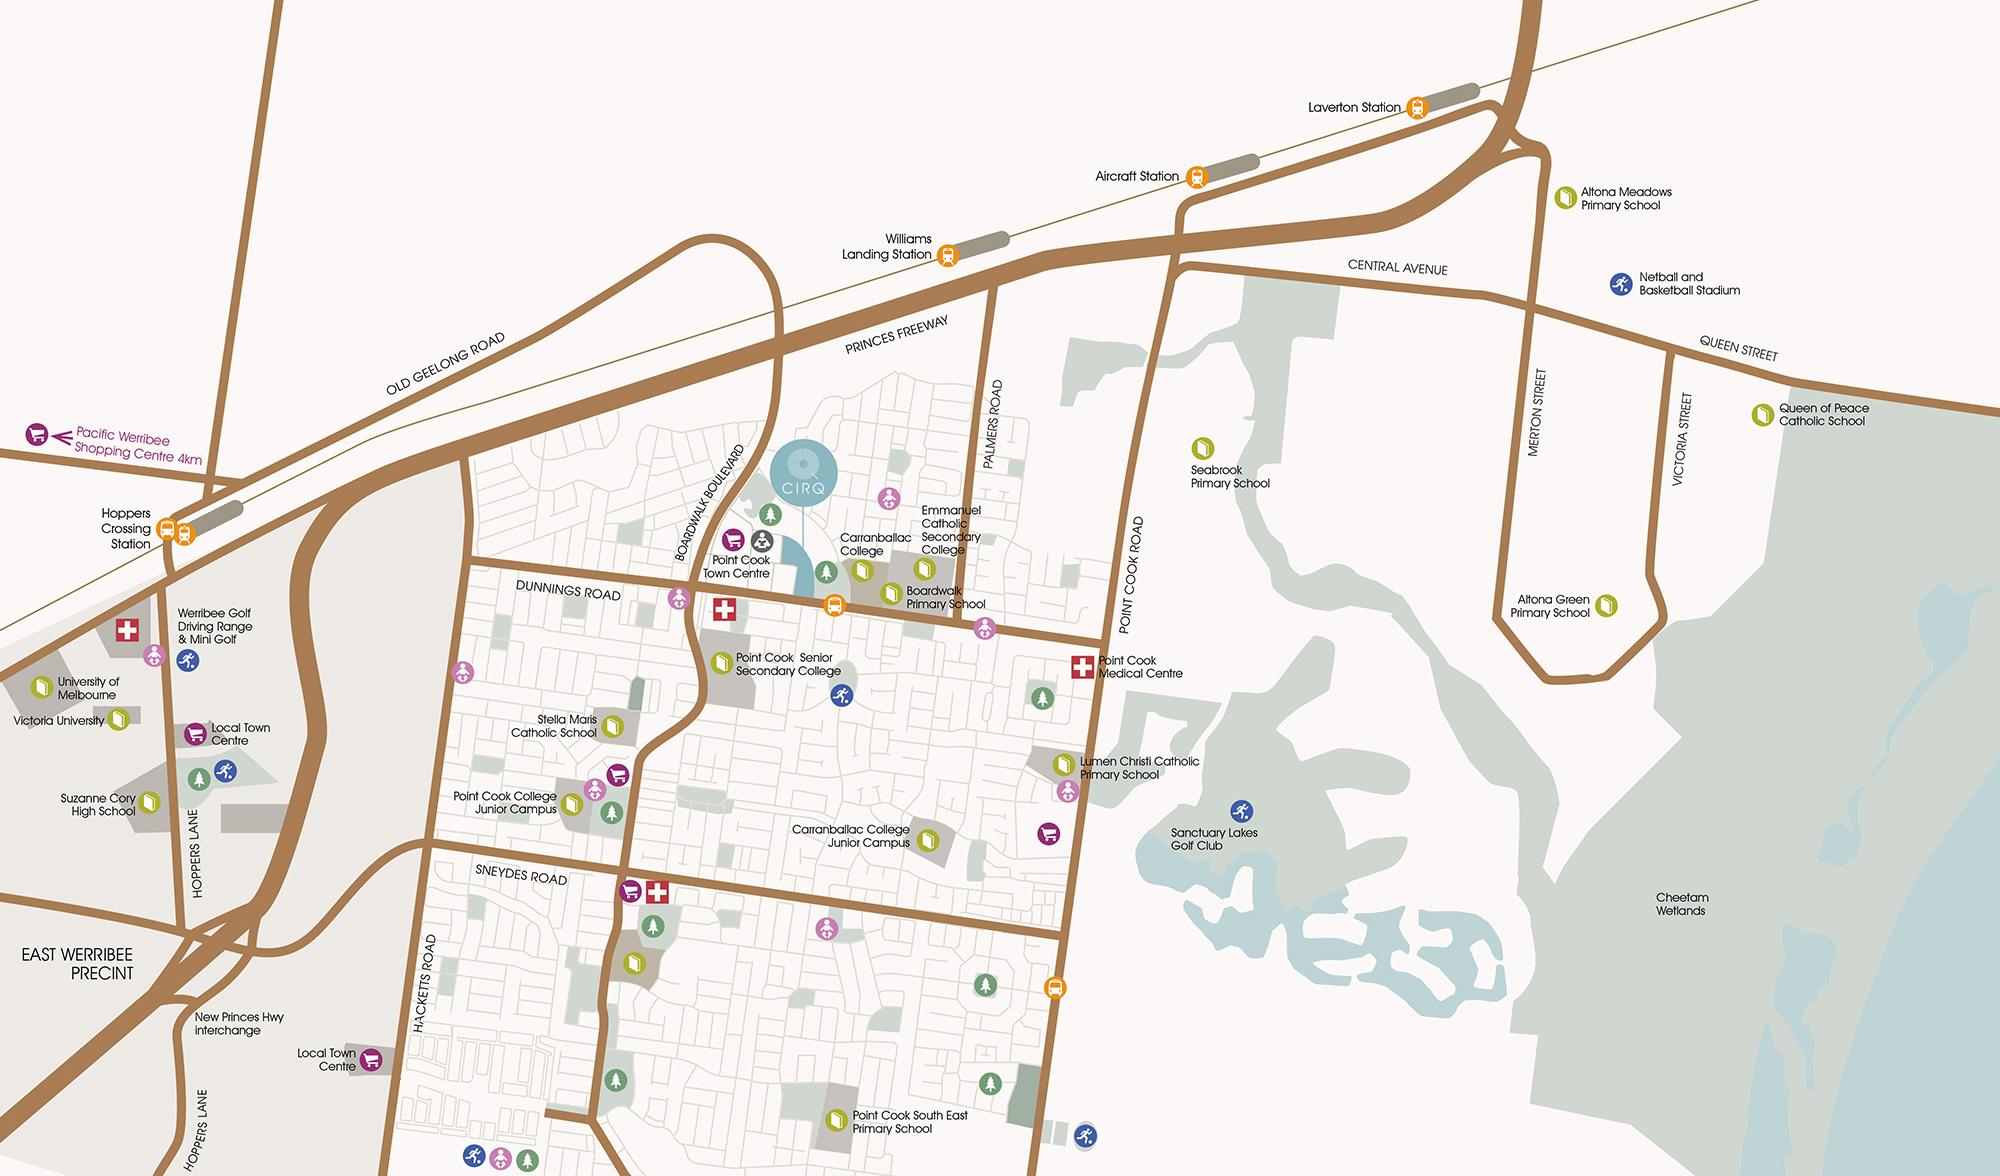 Amenities Map